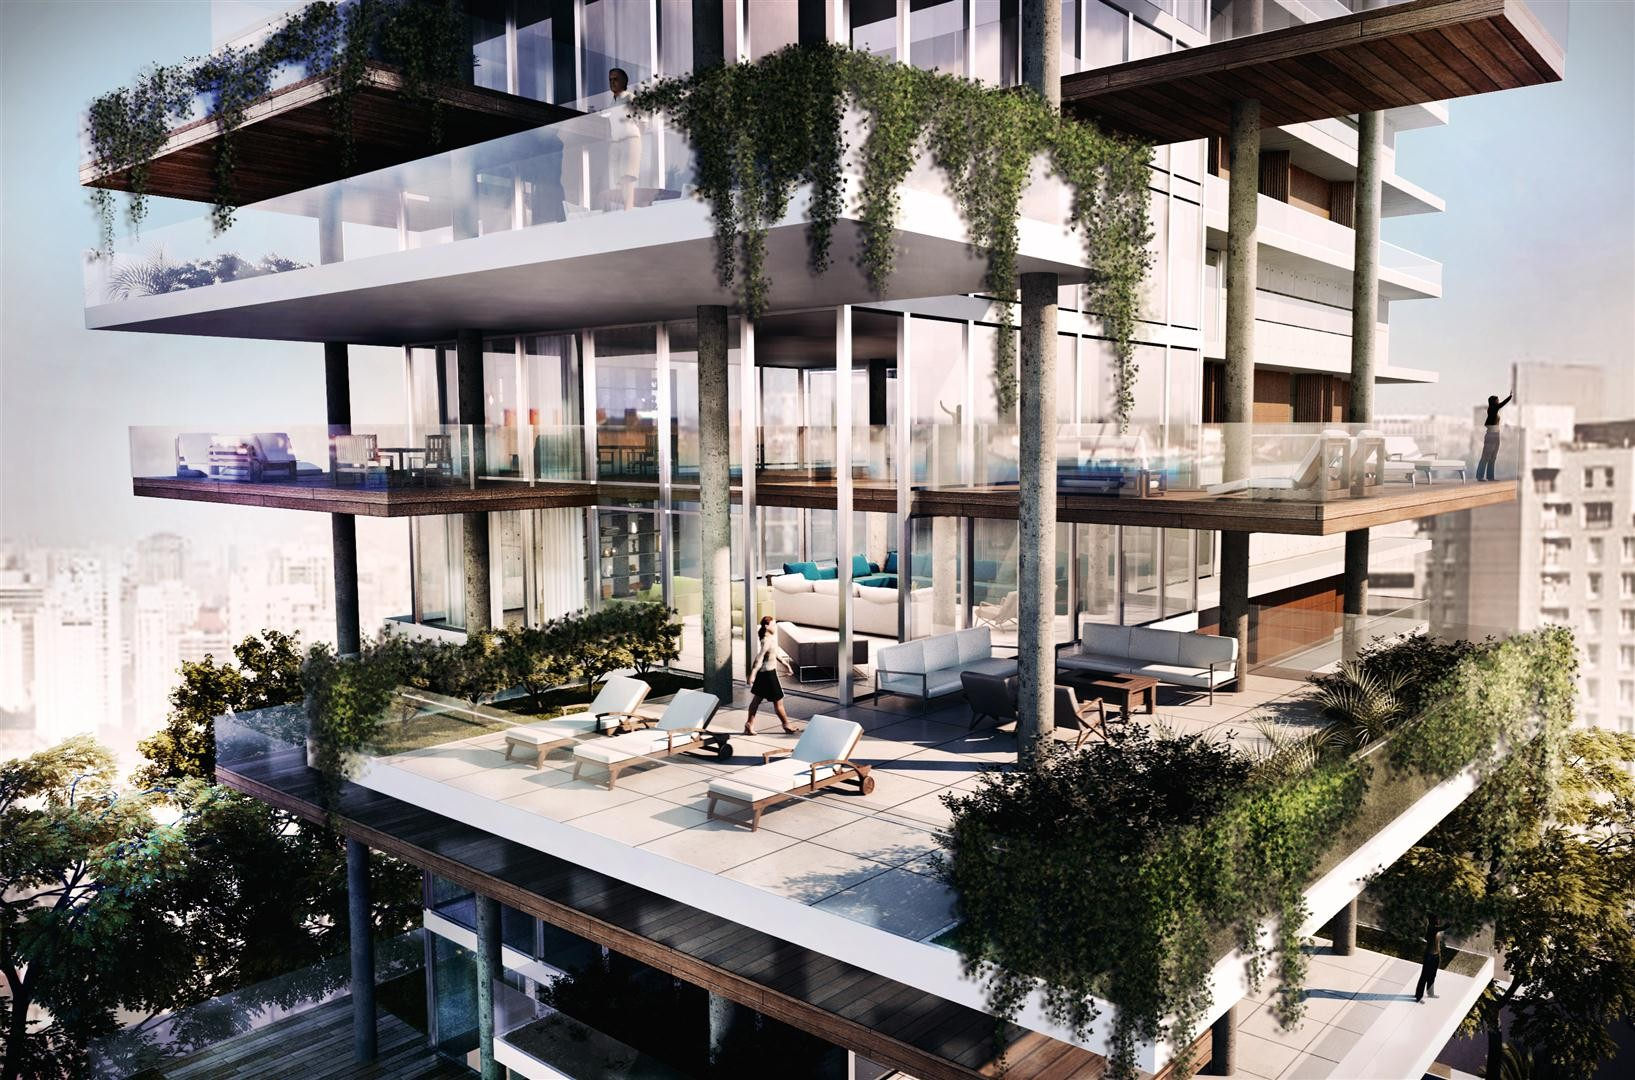 Galer a de edificio itaim fgmf arquitetos 5 for Apartamentos con piscina en alcoceber